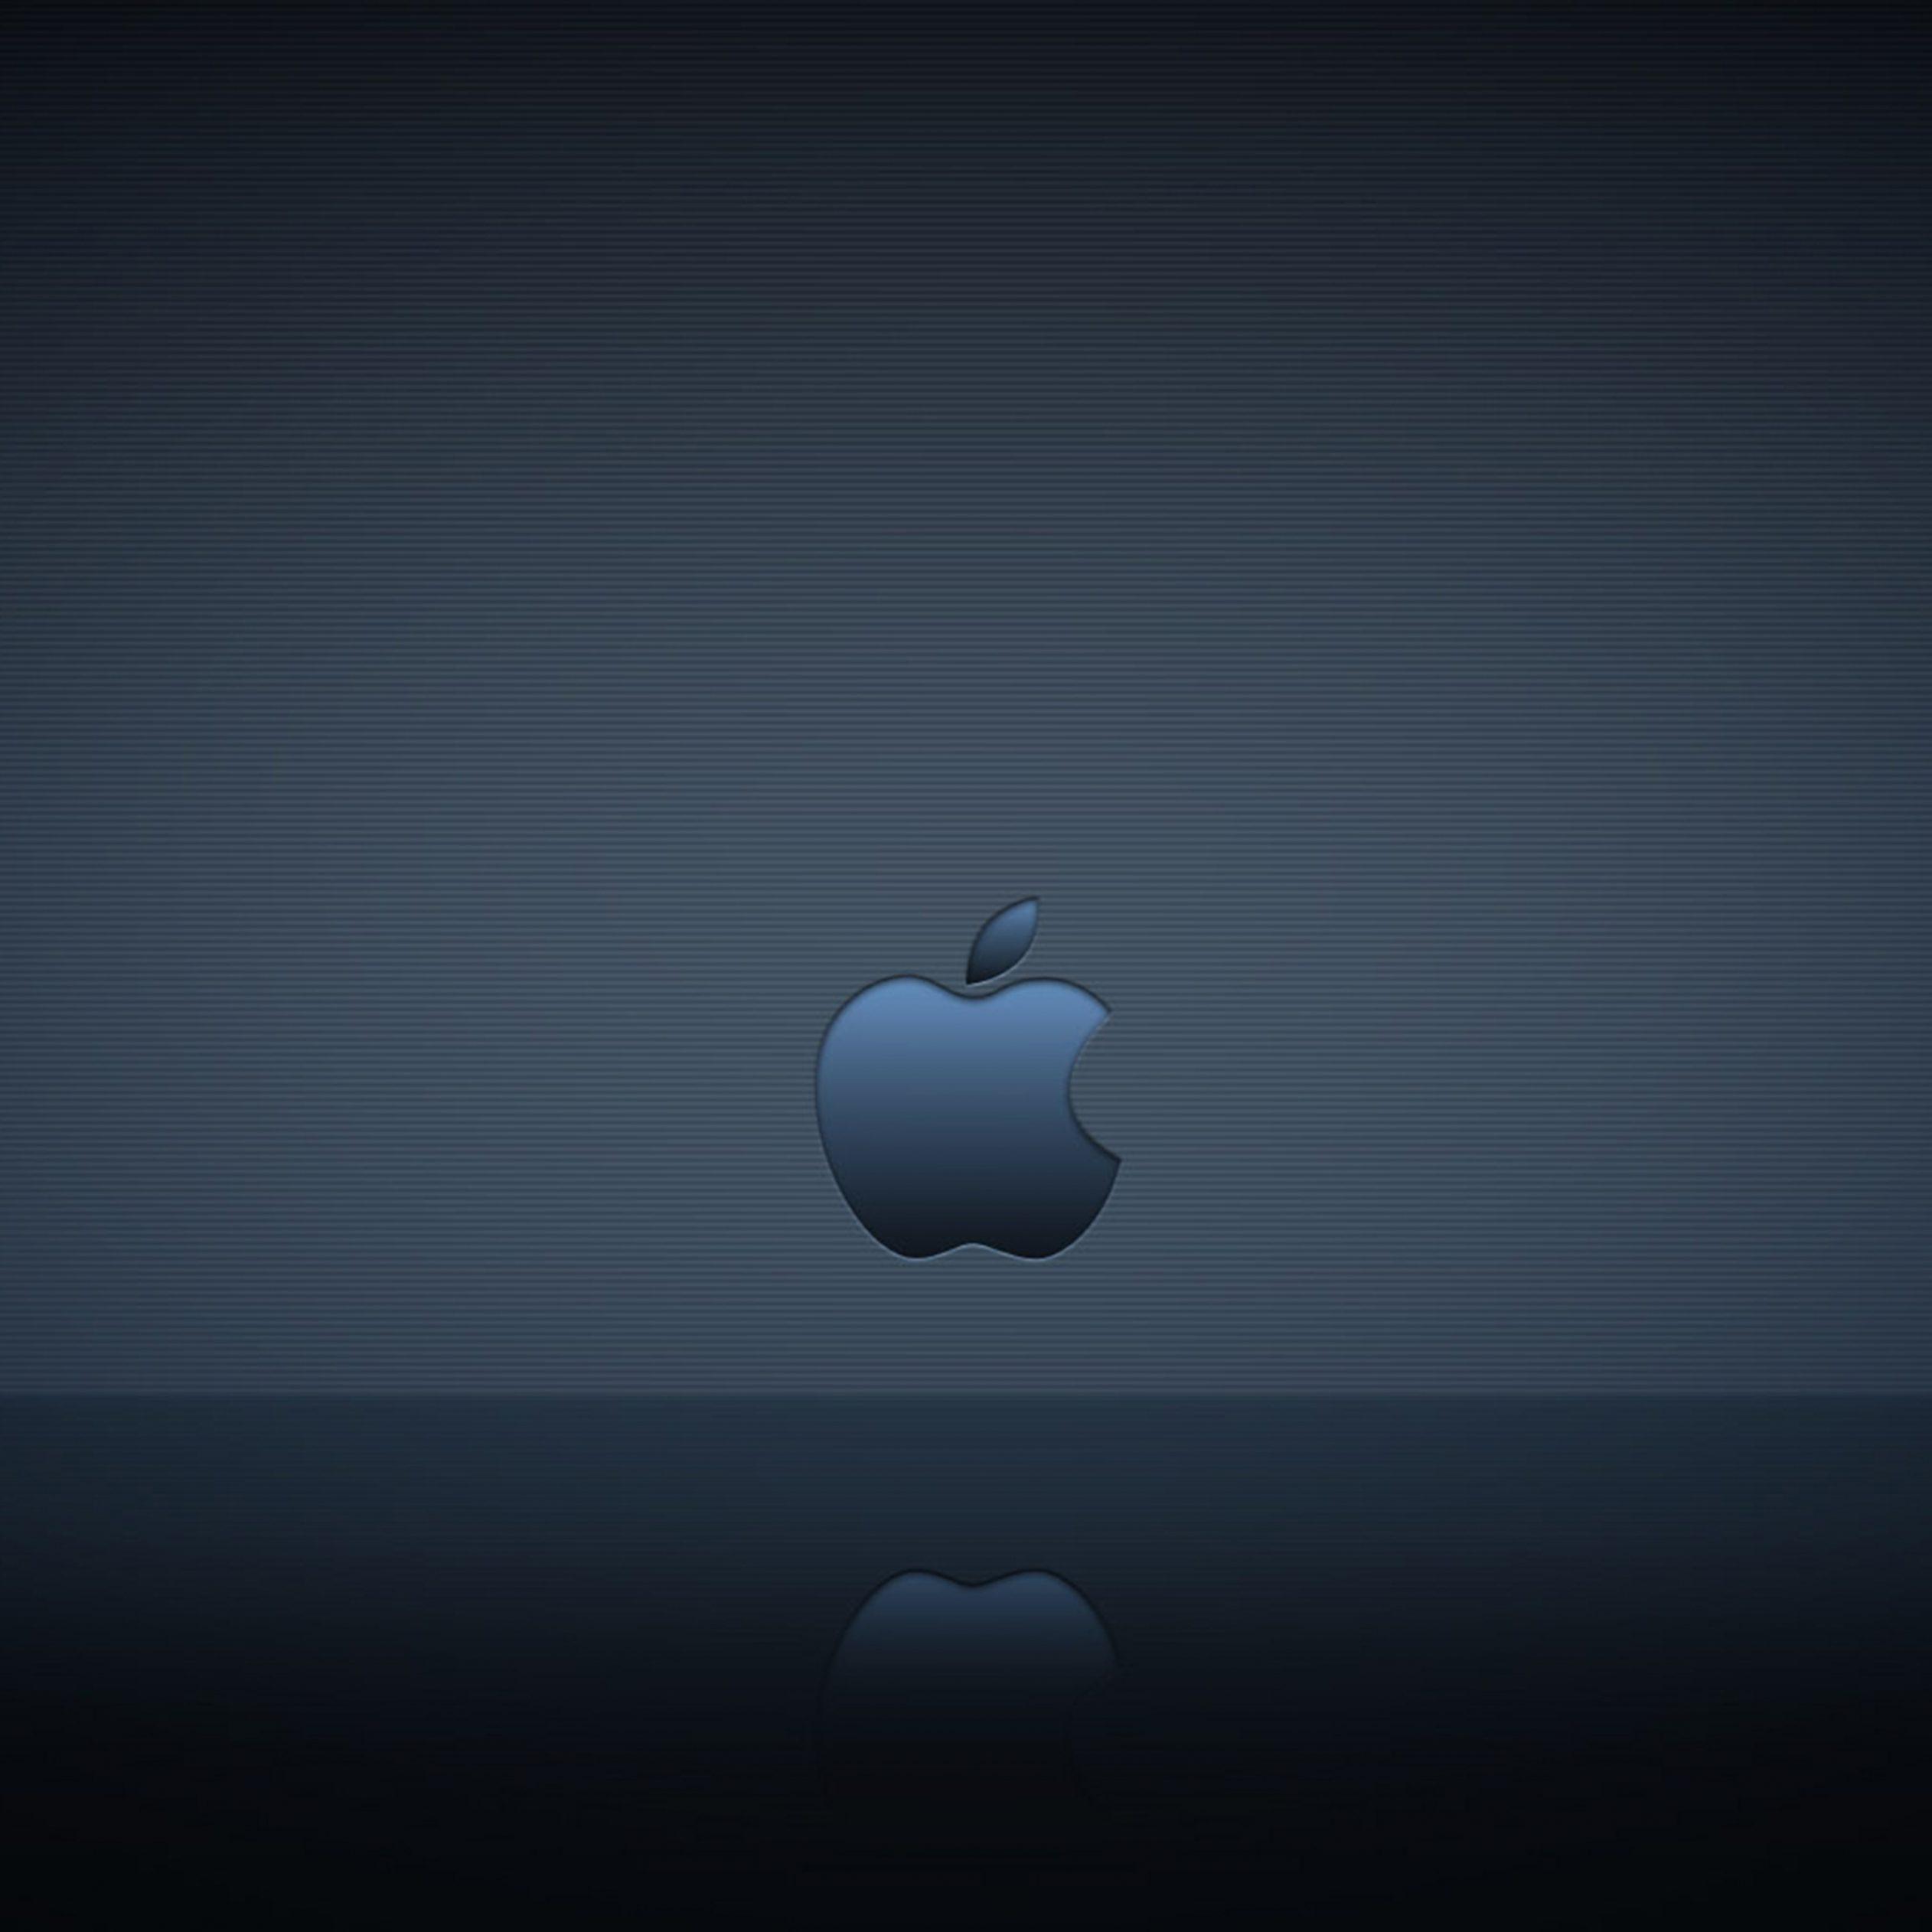 2524x2524 Parallax wallpaper 4k Apple Logo Reflection Ipad Wallpaper 2524x2524 pixels resolution